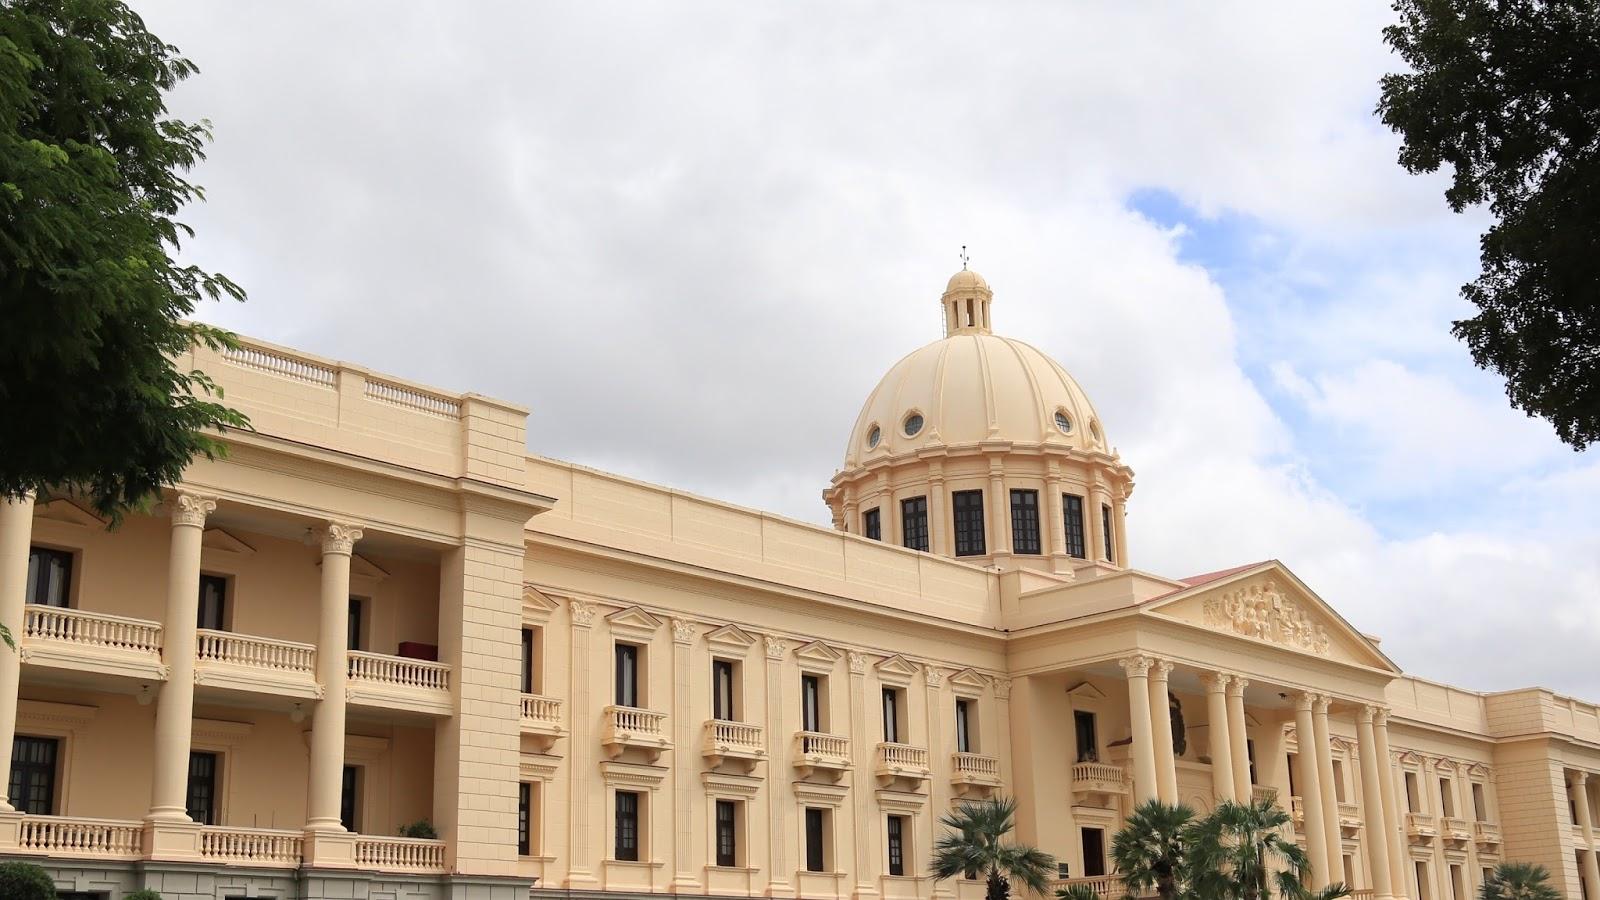 Presidente Danilo Medina crea mediante decreto el Jardín Botánico de Santiago